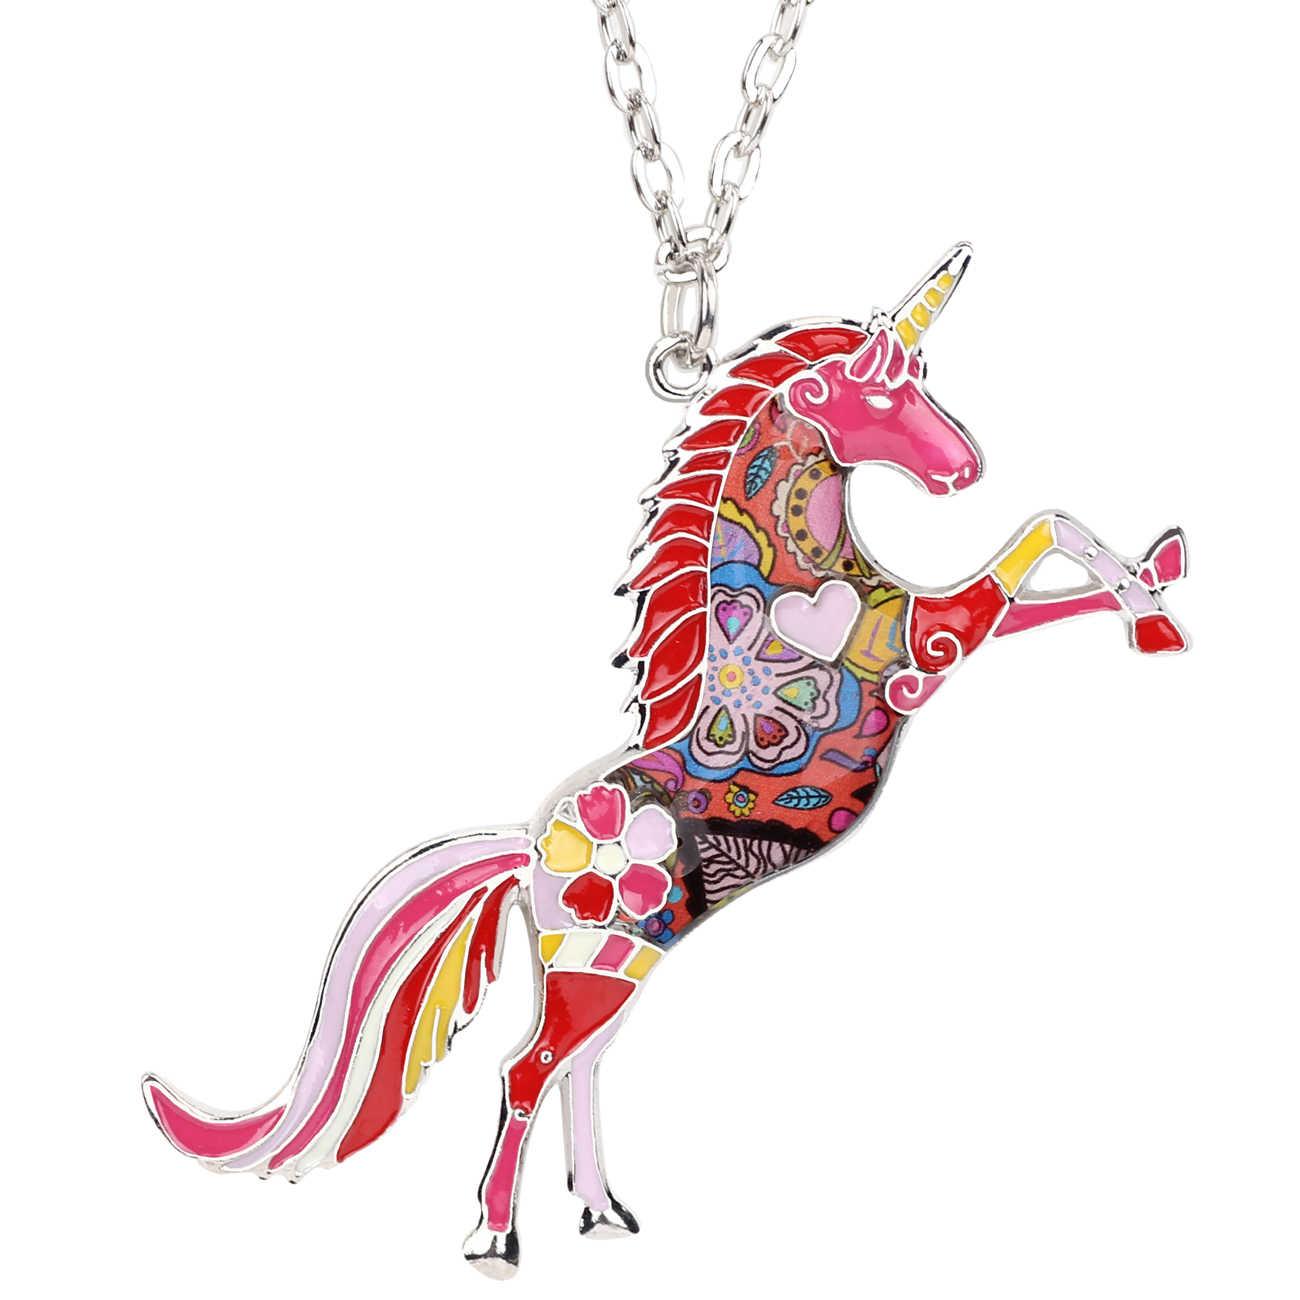 Bonsny statement metal esmalte cavalo unicórnio colar pingente colar gargantilha animais charme elegante jóias para mulheres meninas presentes